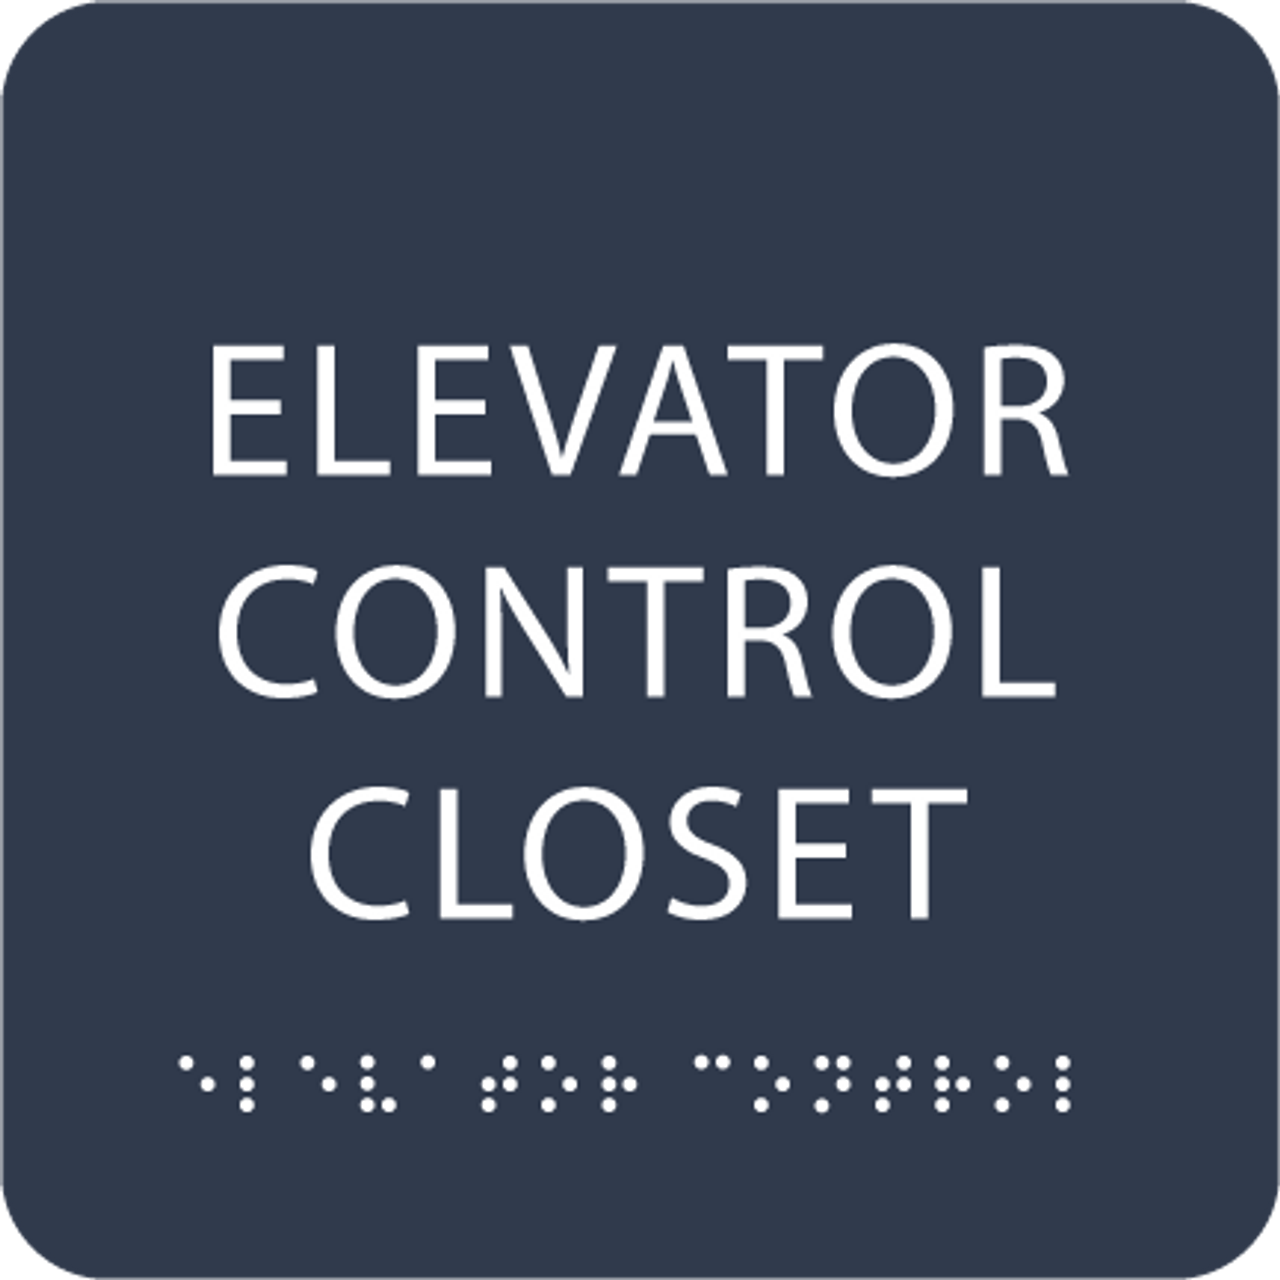 Navy Elevator Control Closet ADA Sign